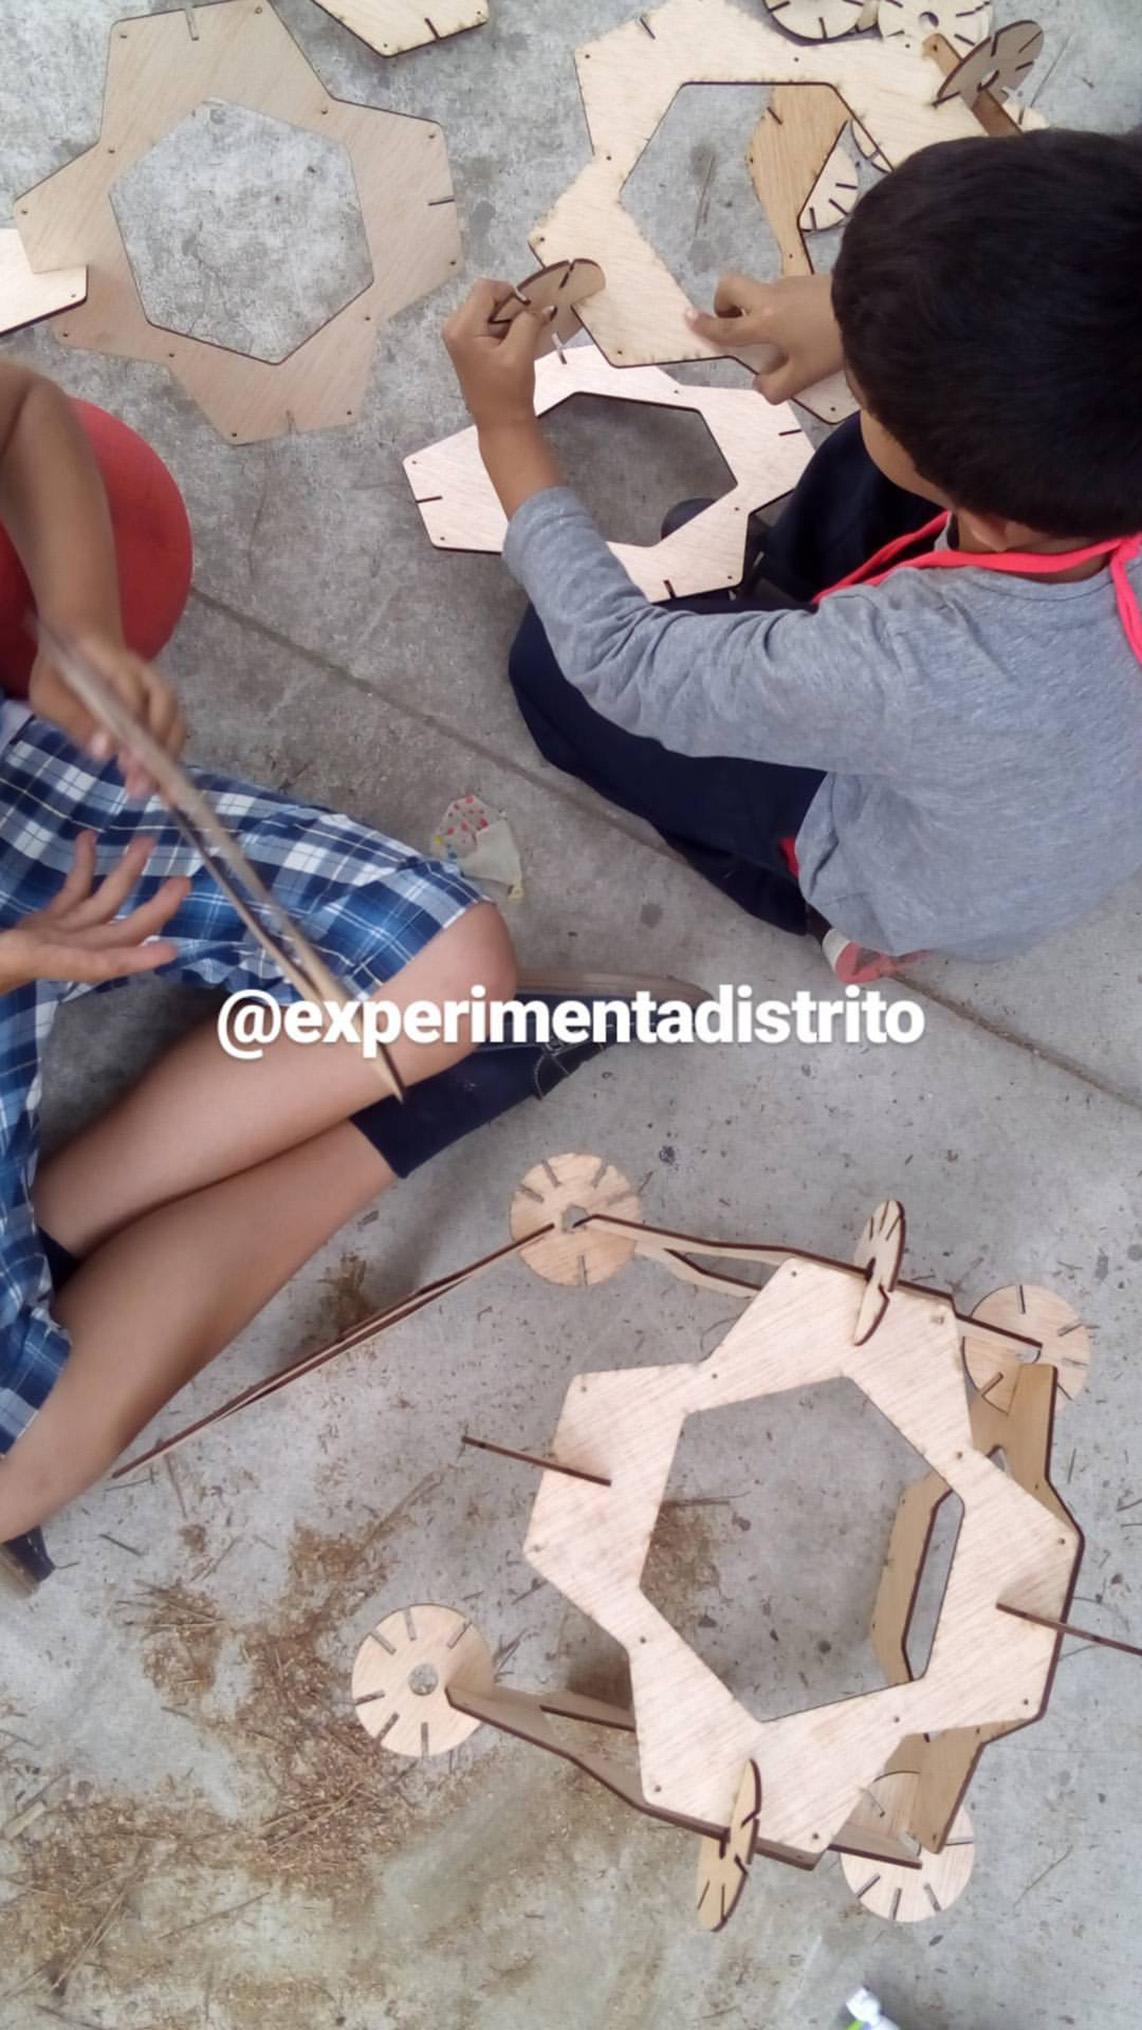 EXPERIMENTA 3x(v 3.0)